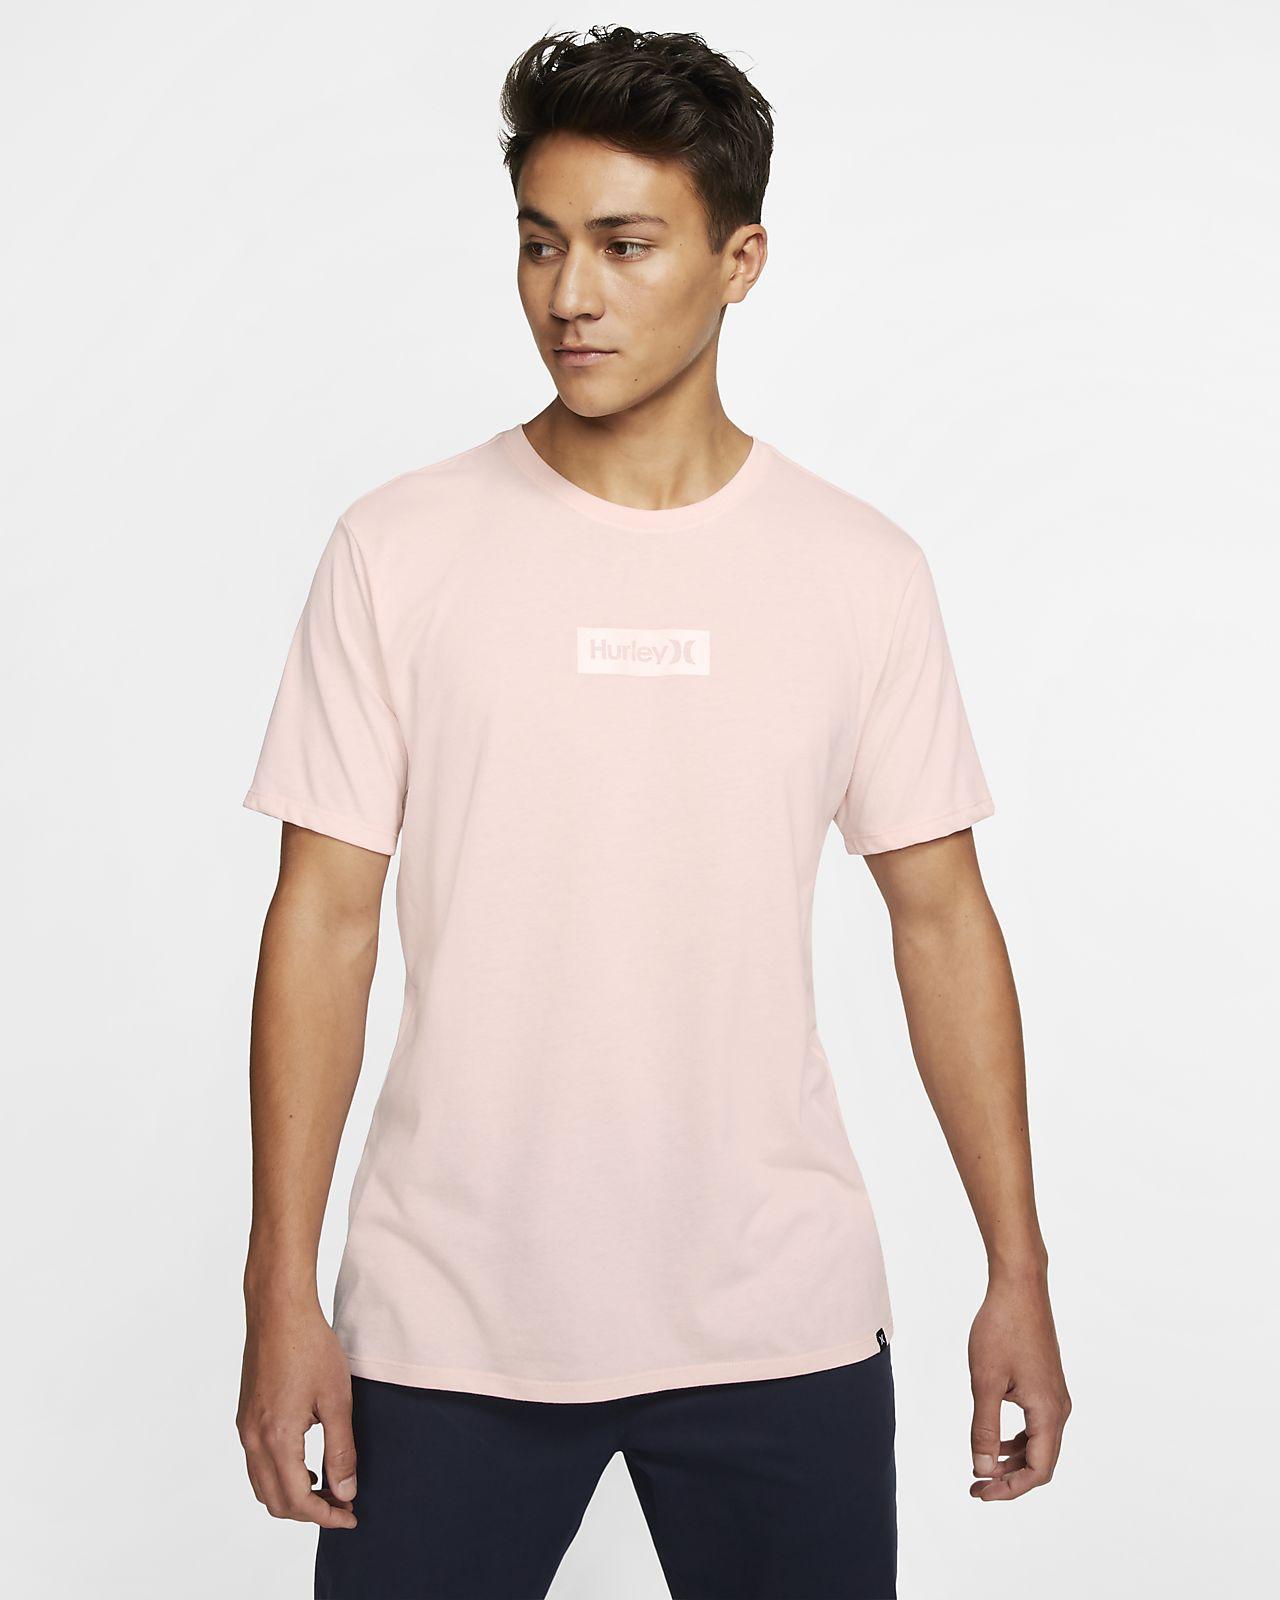 Pánské tričko Hurley Dri-FIT One And Only Small Box